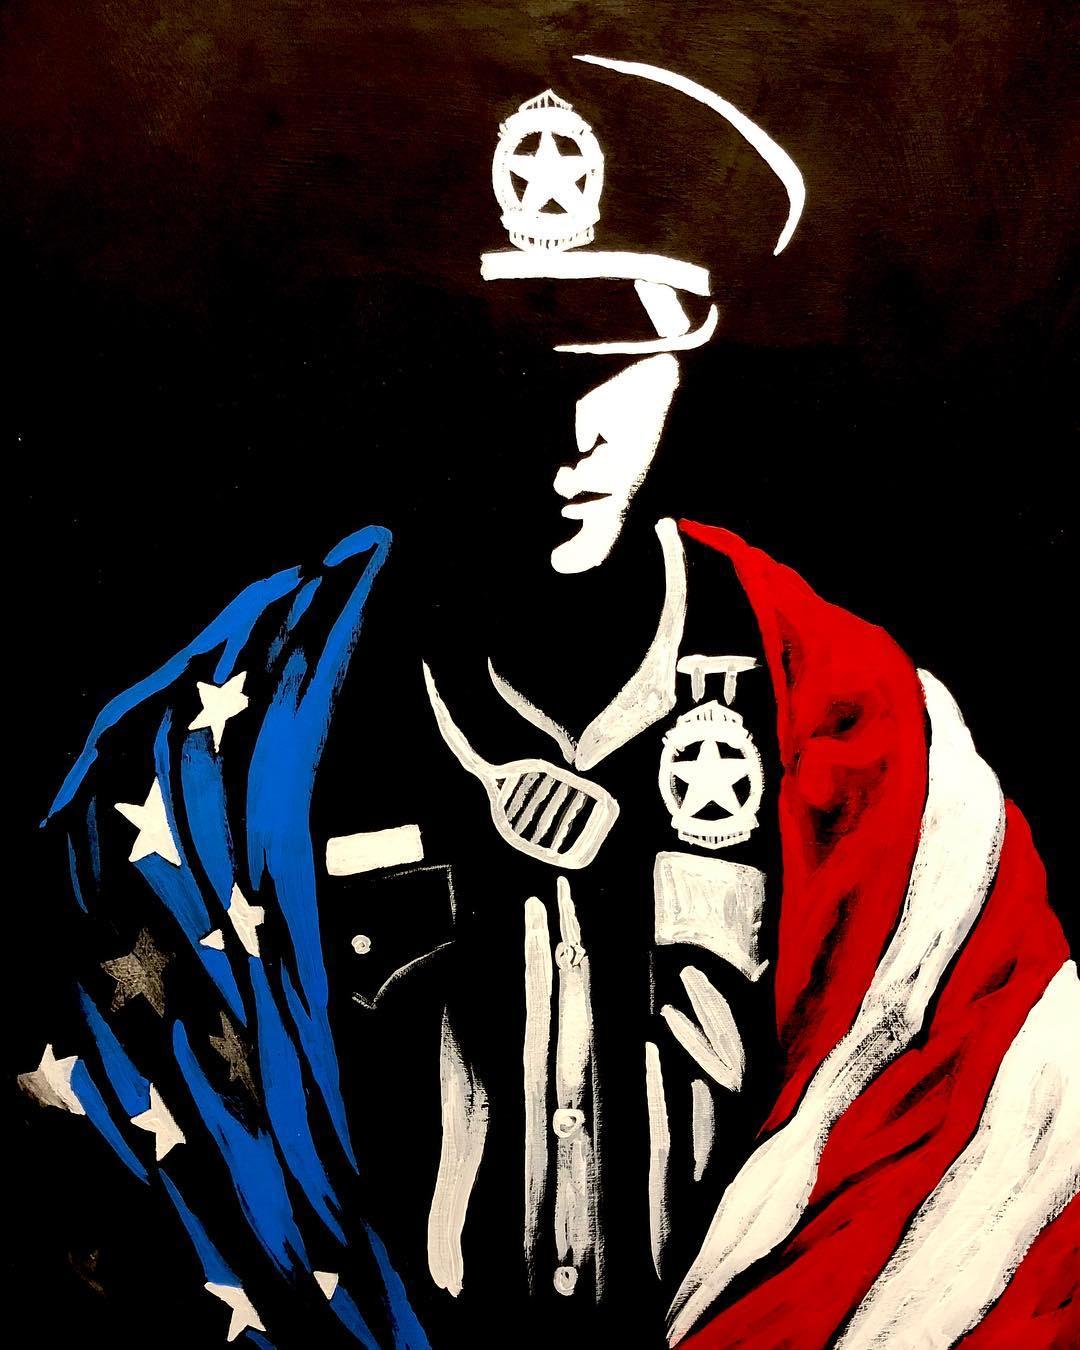 Dallas-police-officer-flag-painting.jpg